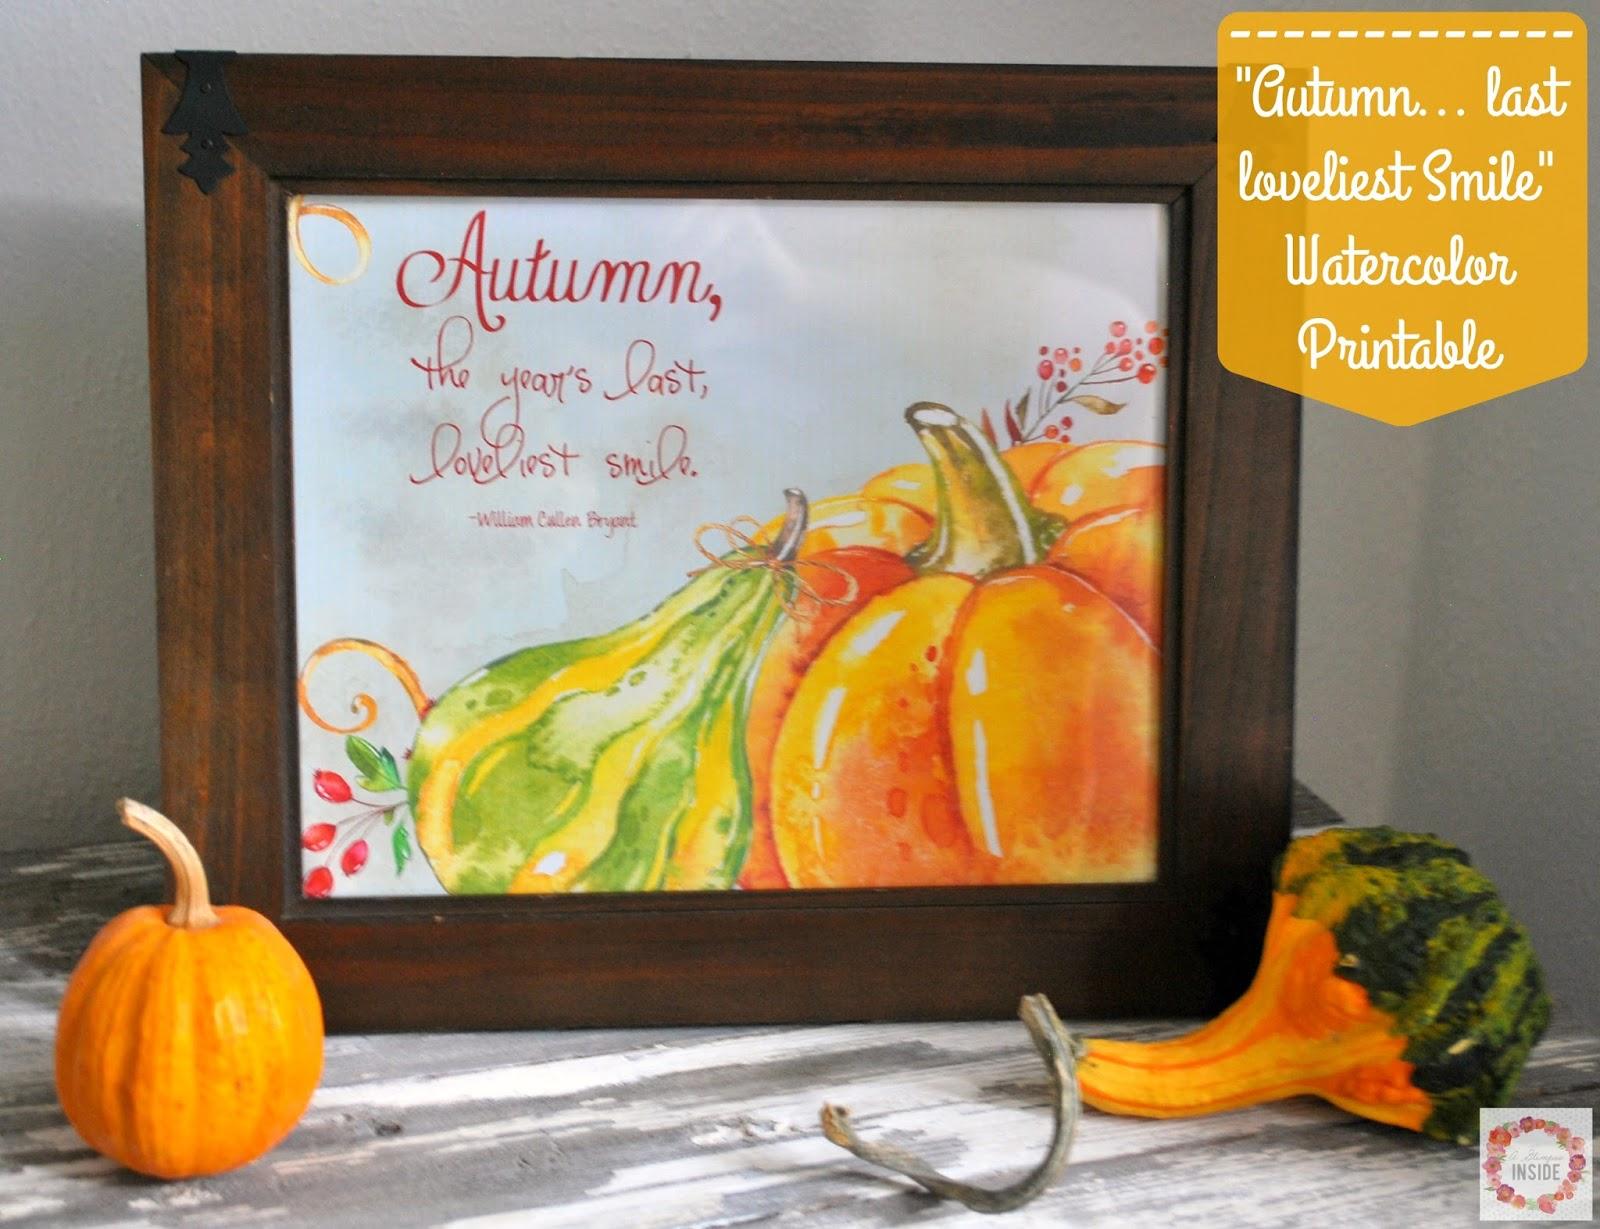 http://www.aglimpseinsideblog.com/2015/10/autumn-last-loveliest-smile-watercolor.html